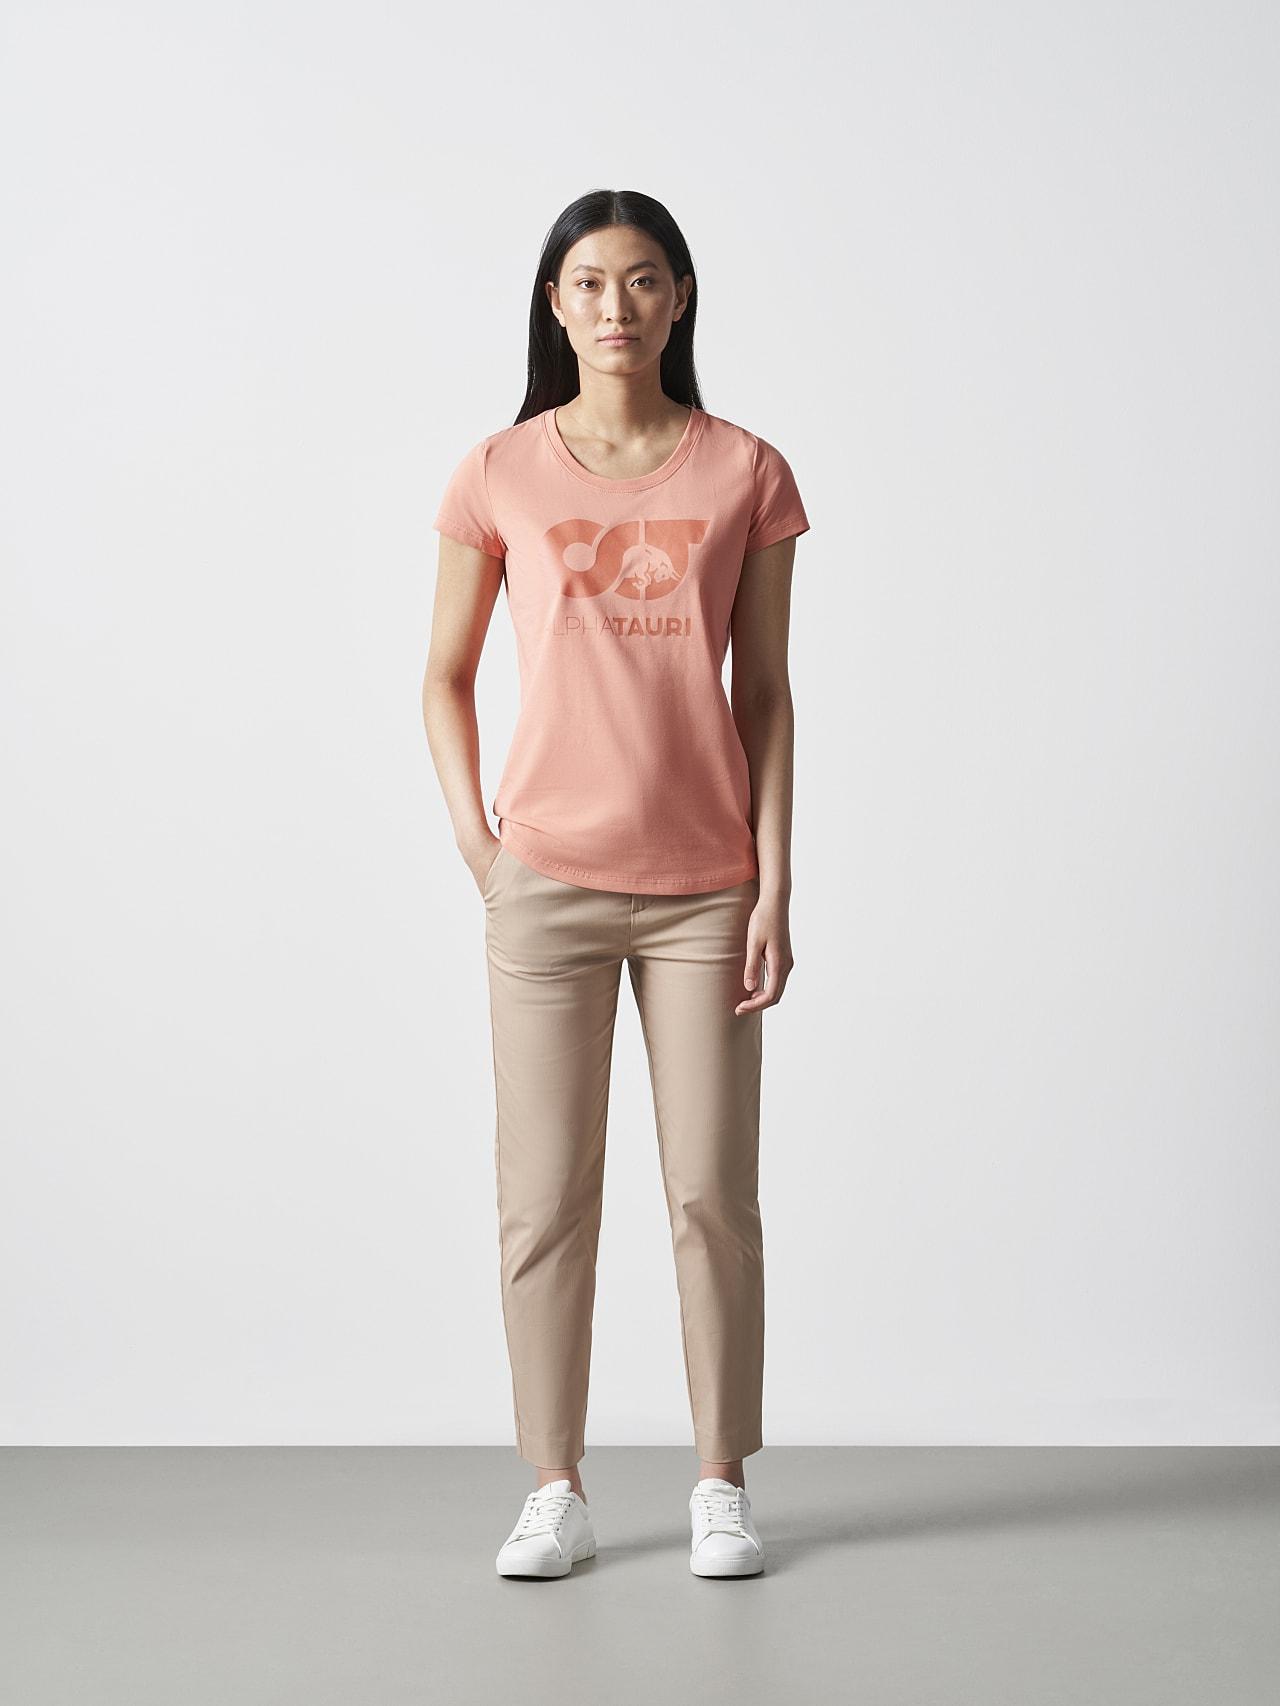 JERU V2.Y4.02 Signature Logo T-Shirt coral Front Alpha Tauri